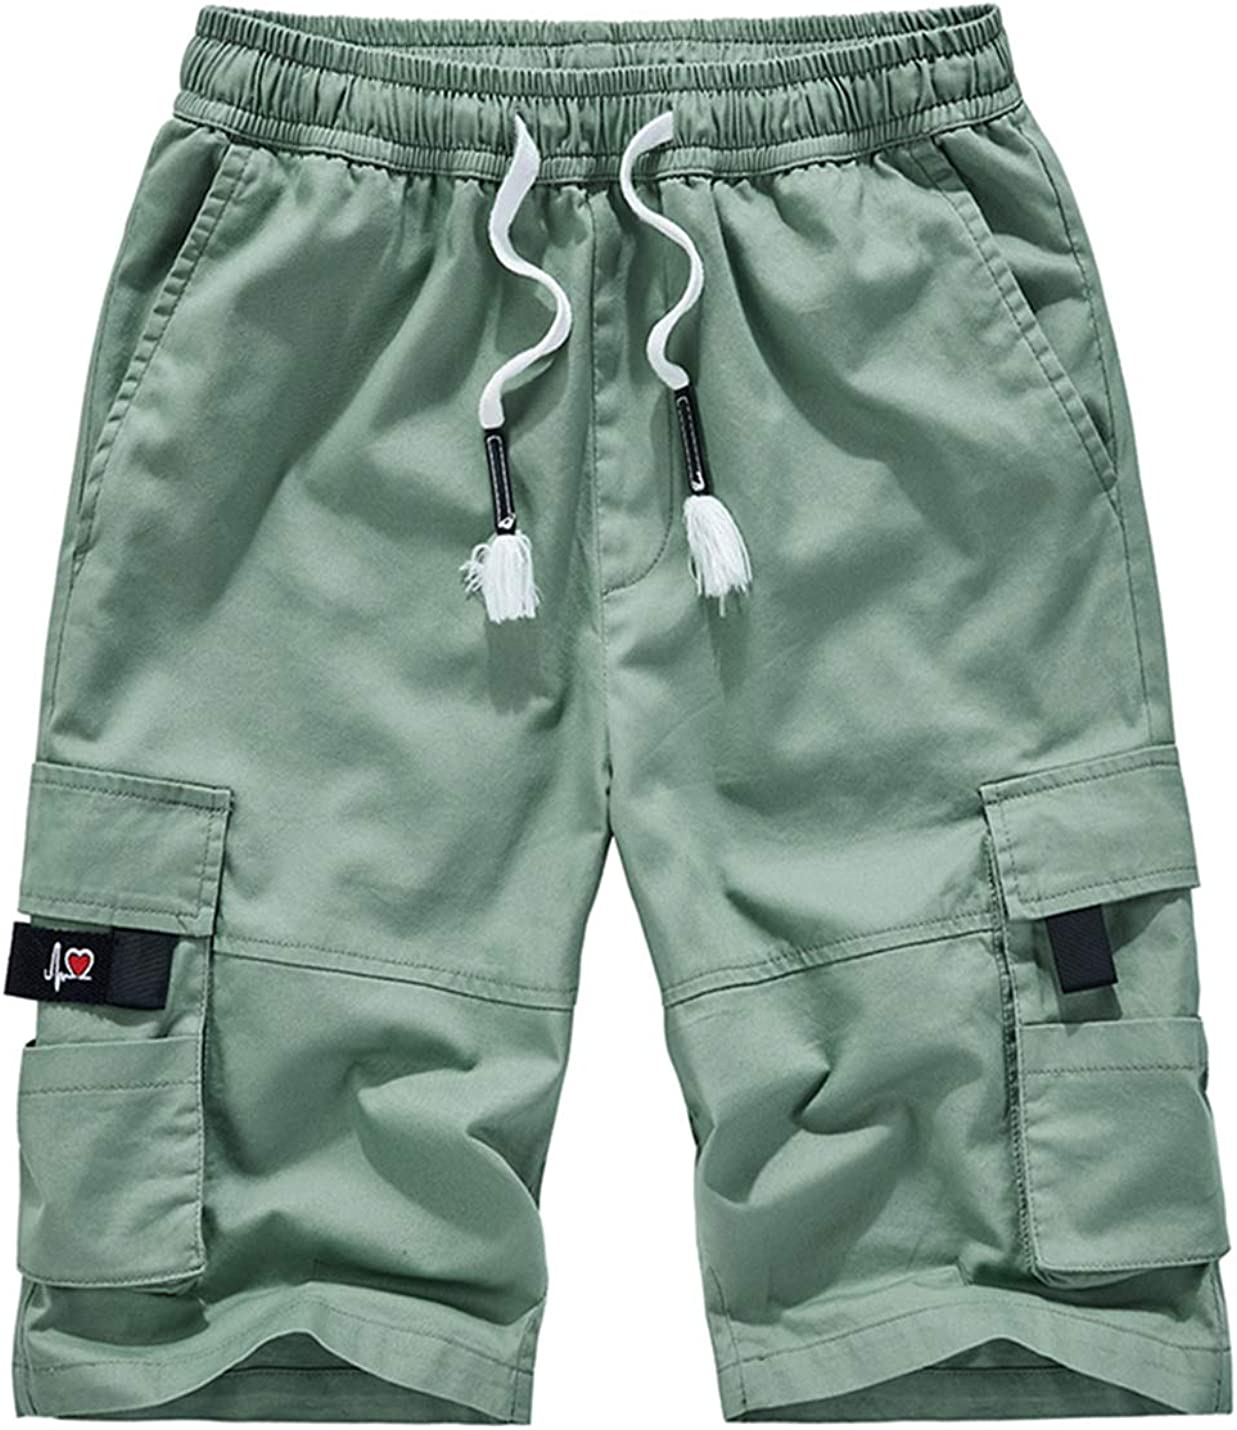 APTRO Mens Cargo Shorts Elastic Waistband Casual Twill Relaxed Fit Summer Short